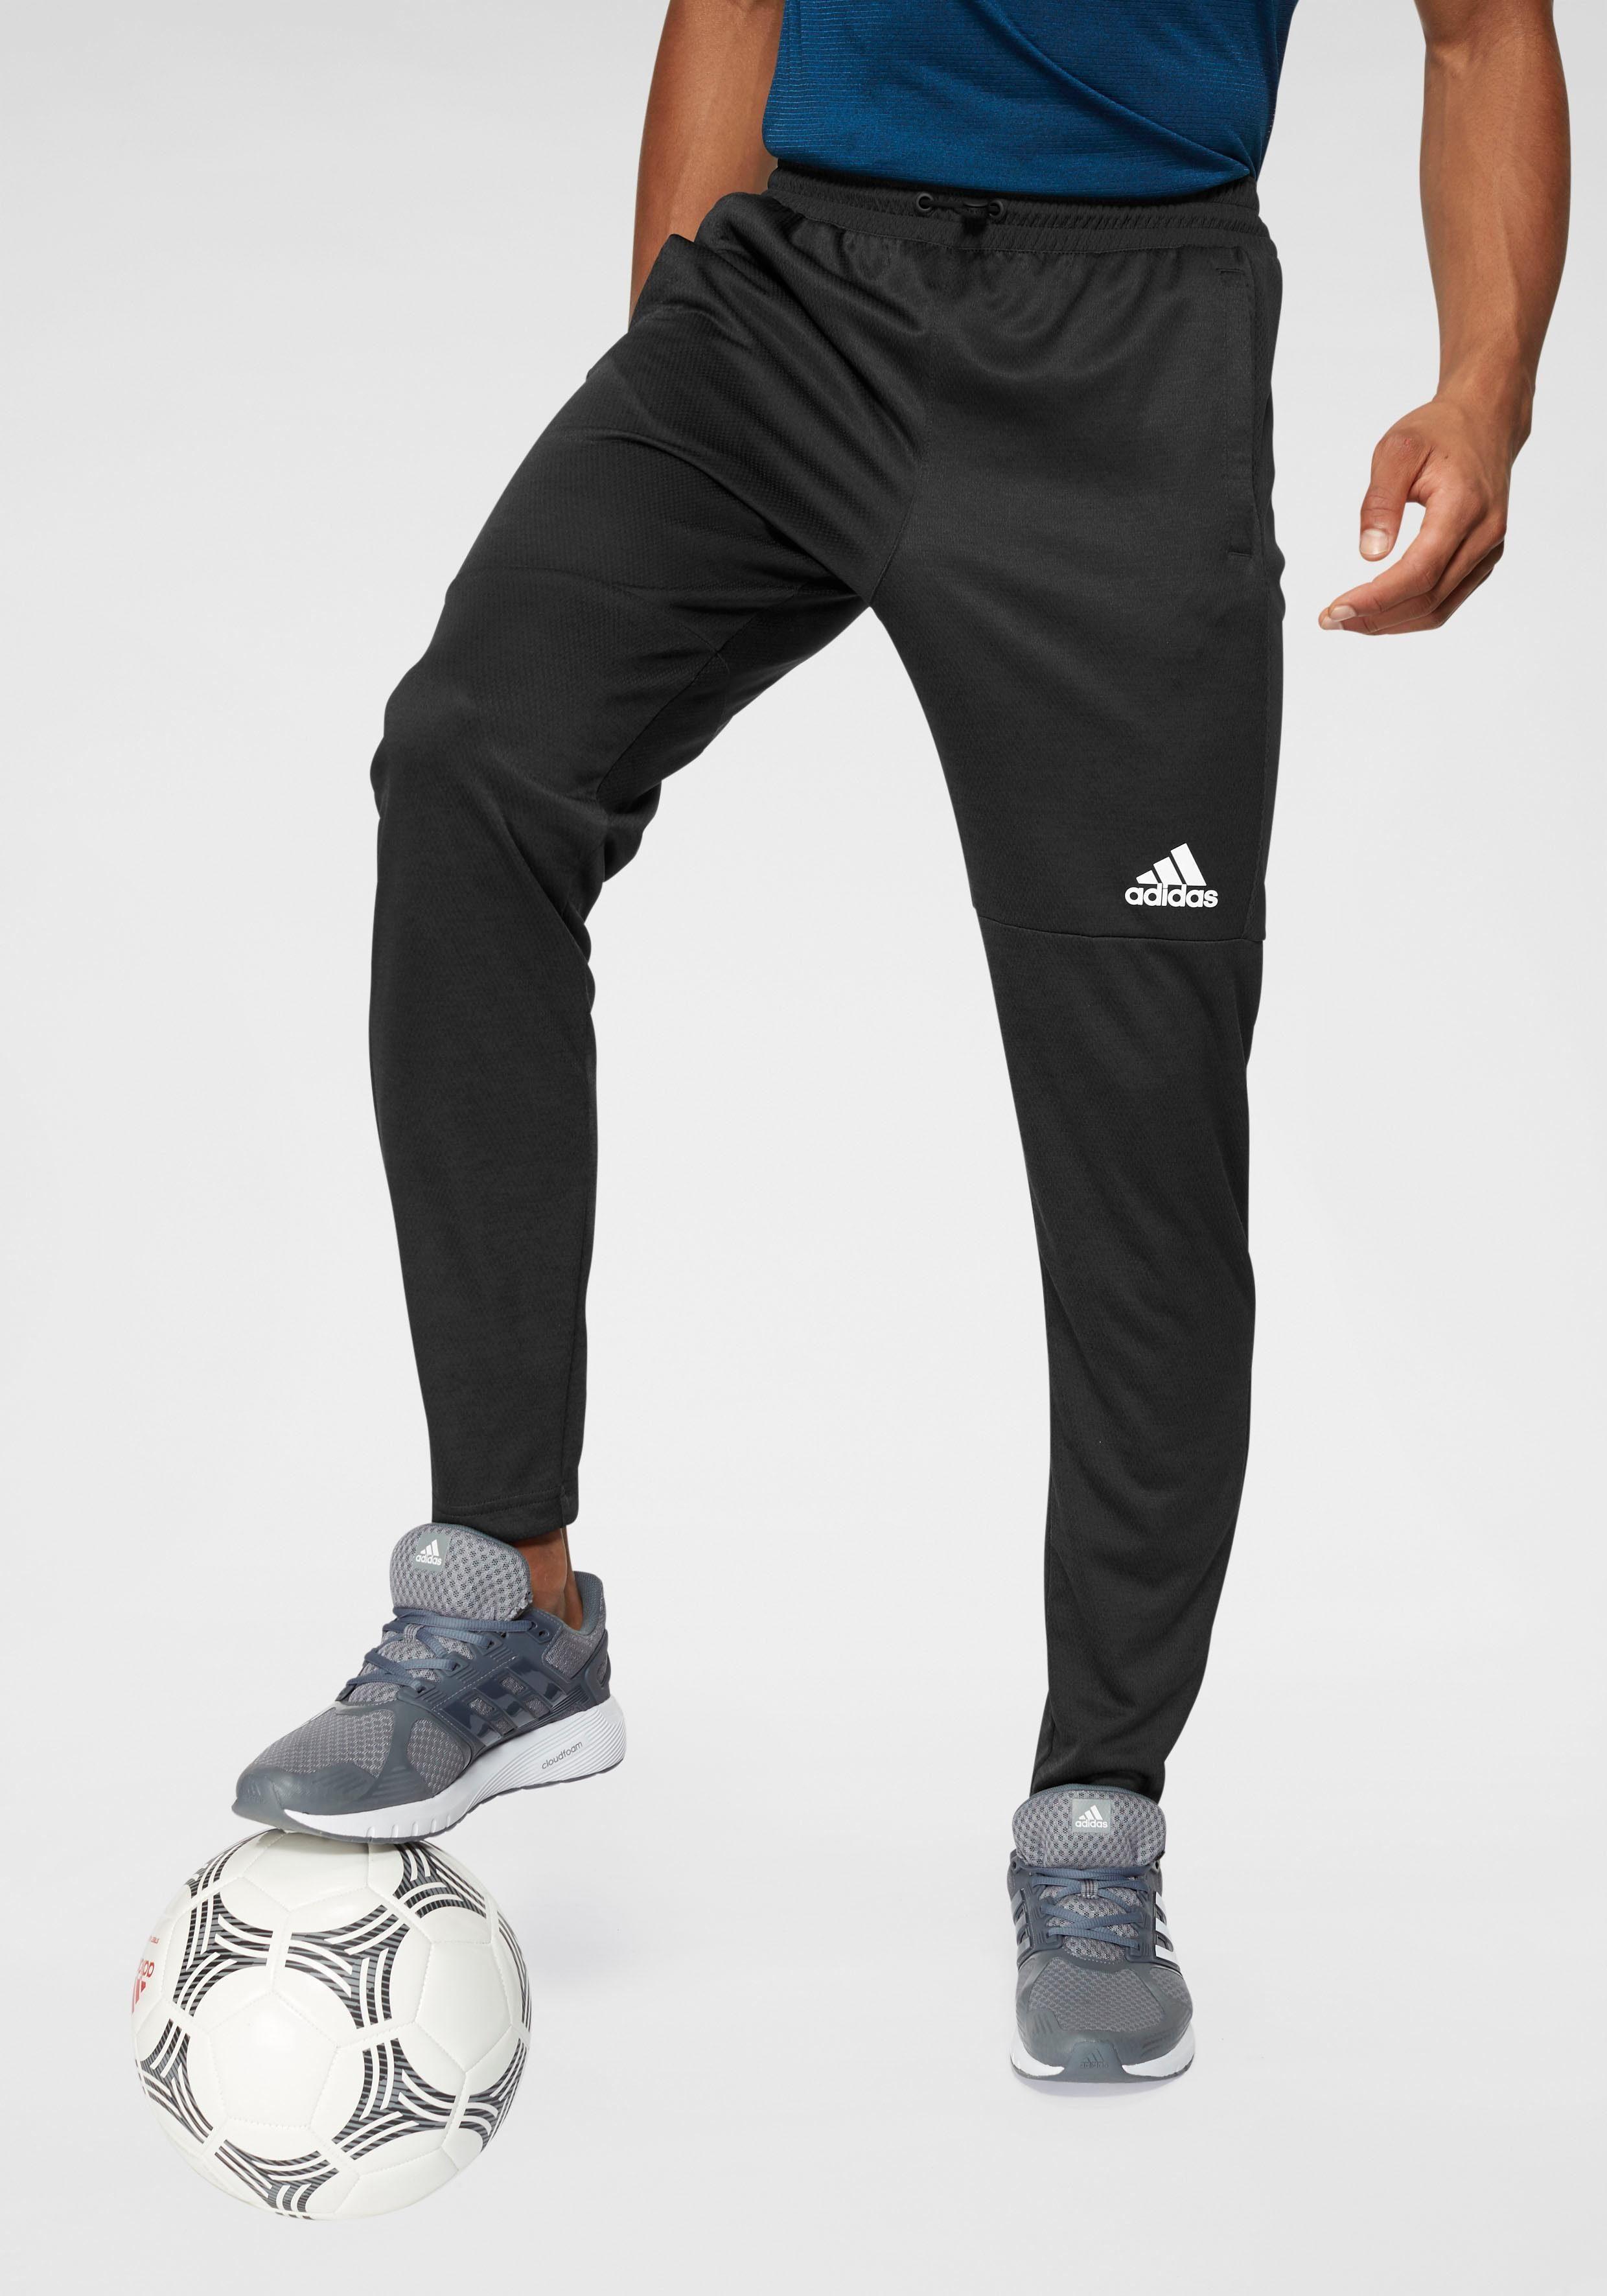 adidas Performance Trainingshose »M TI LITE PANT« | OTTO